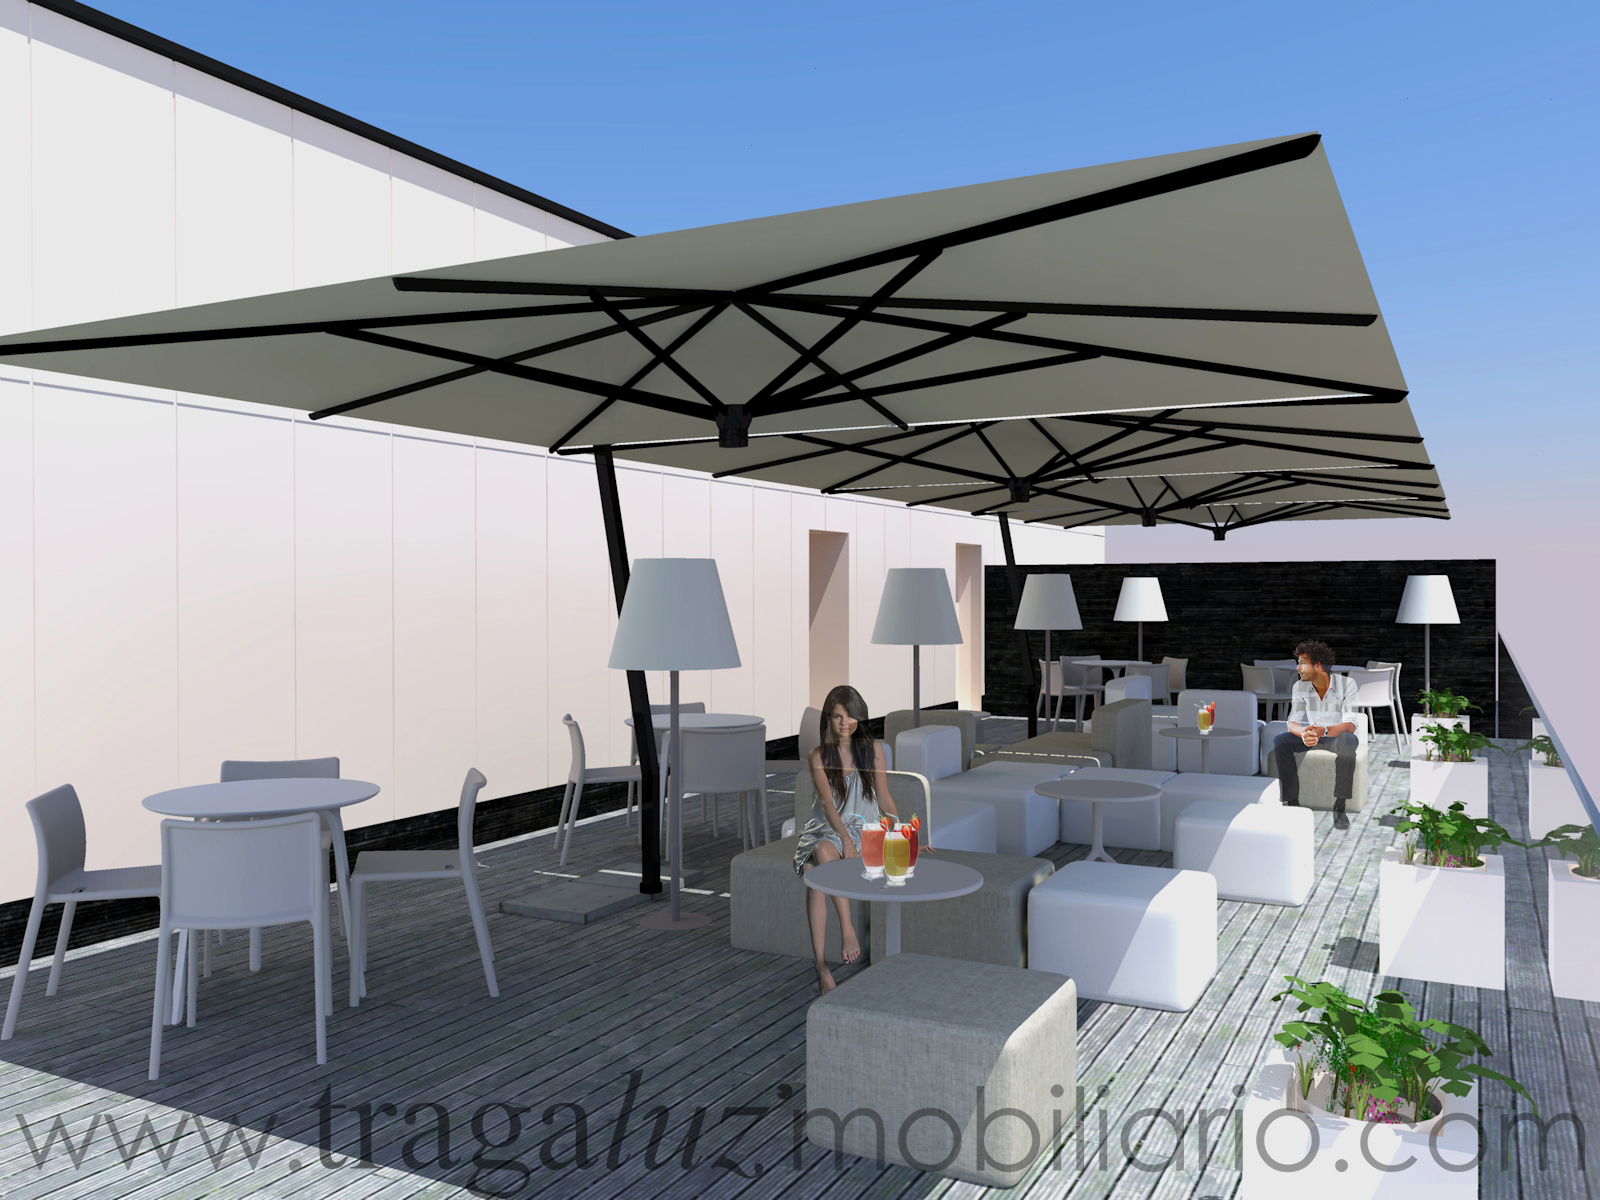 Moderno mobiliario para la terraza revista muebles for Muebles terraza diseno